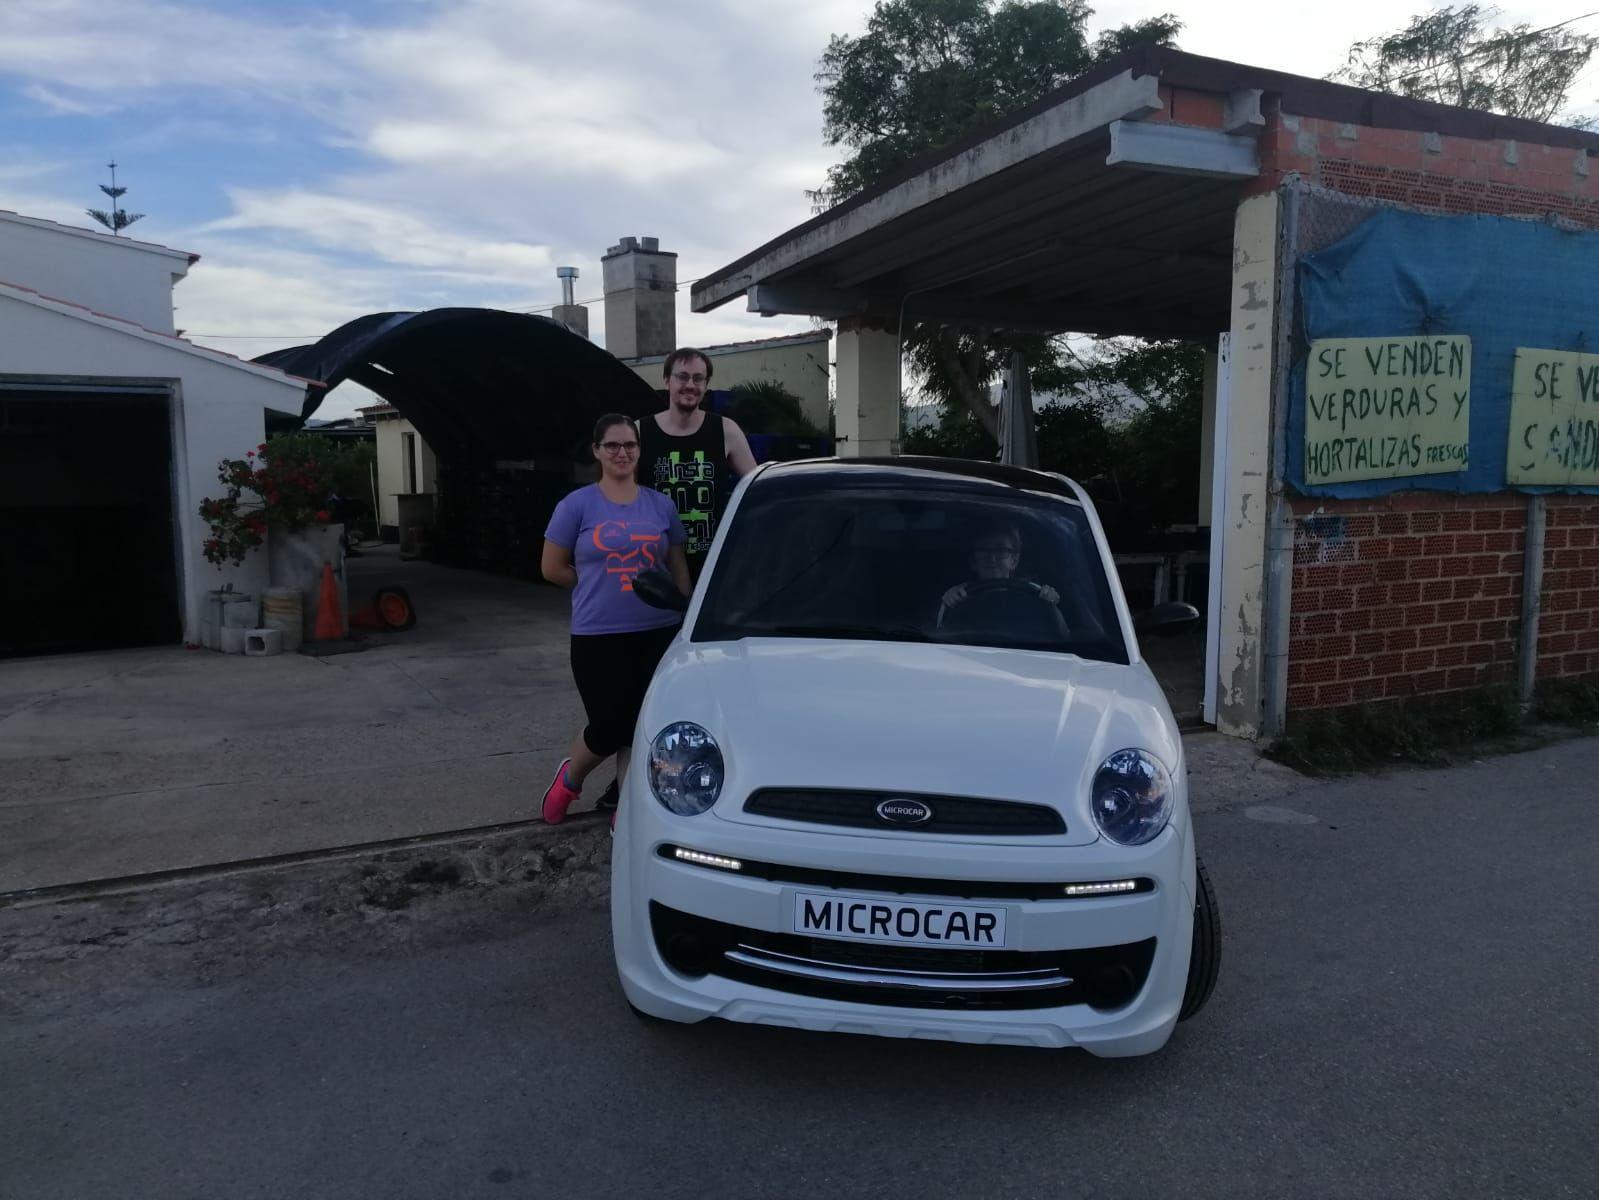 Milautomóviles entrega un Microcar Due a Dolores